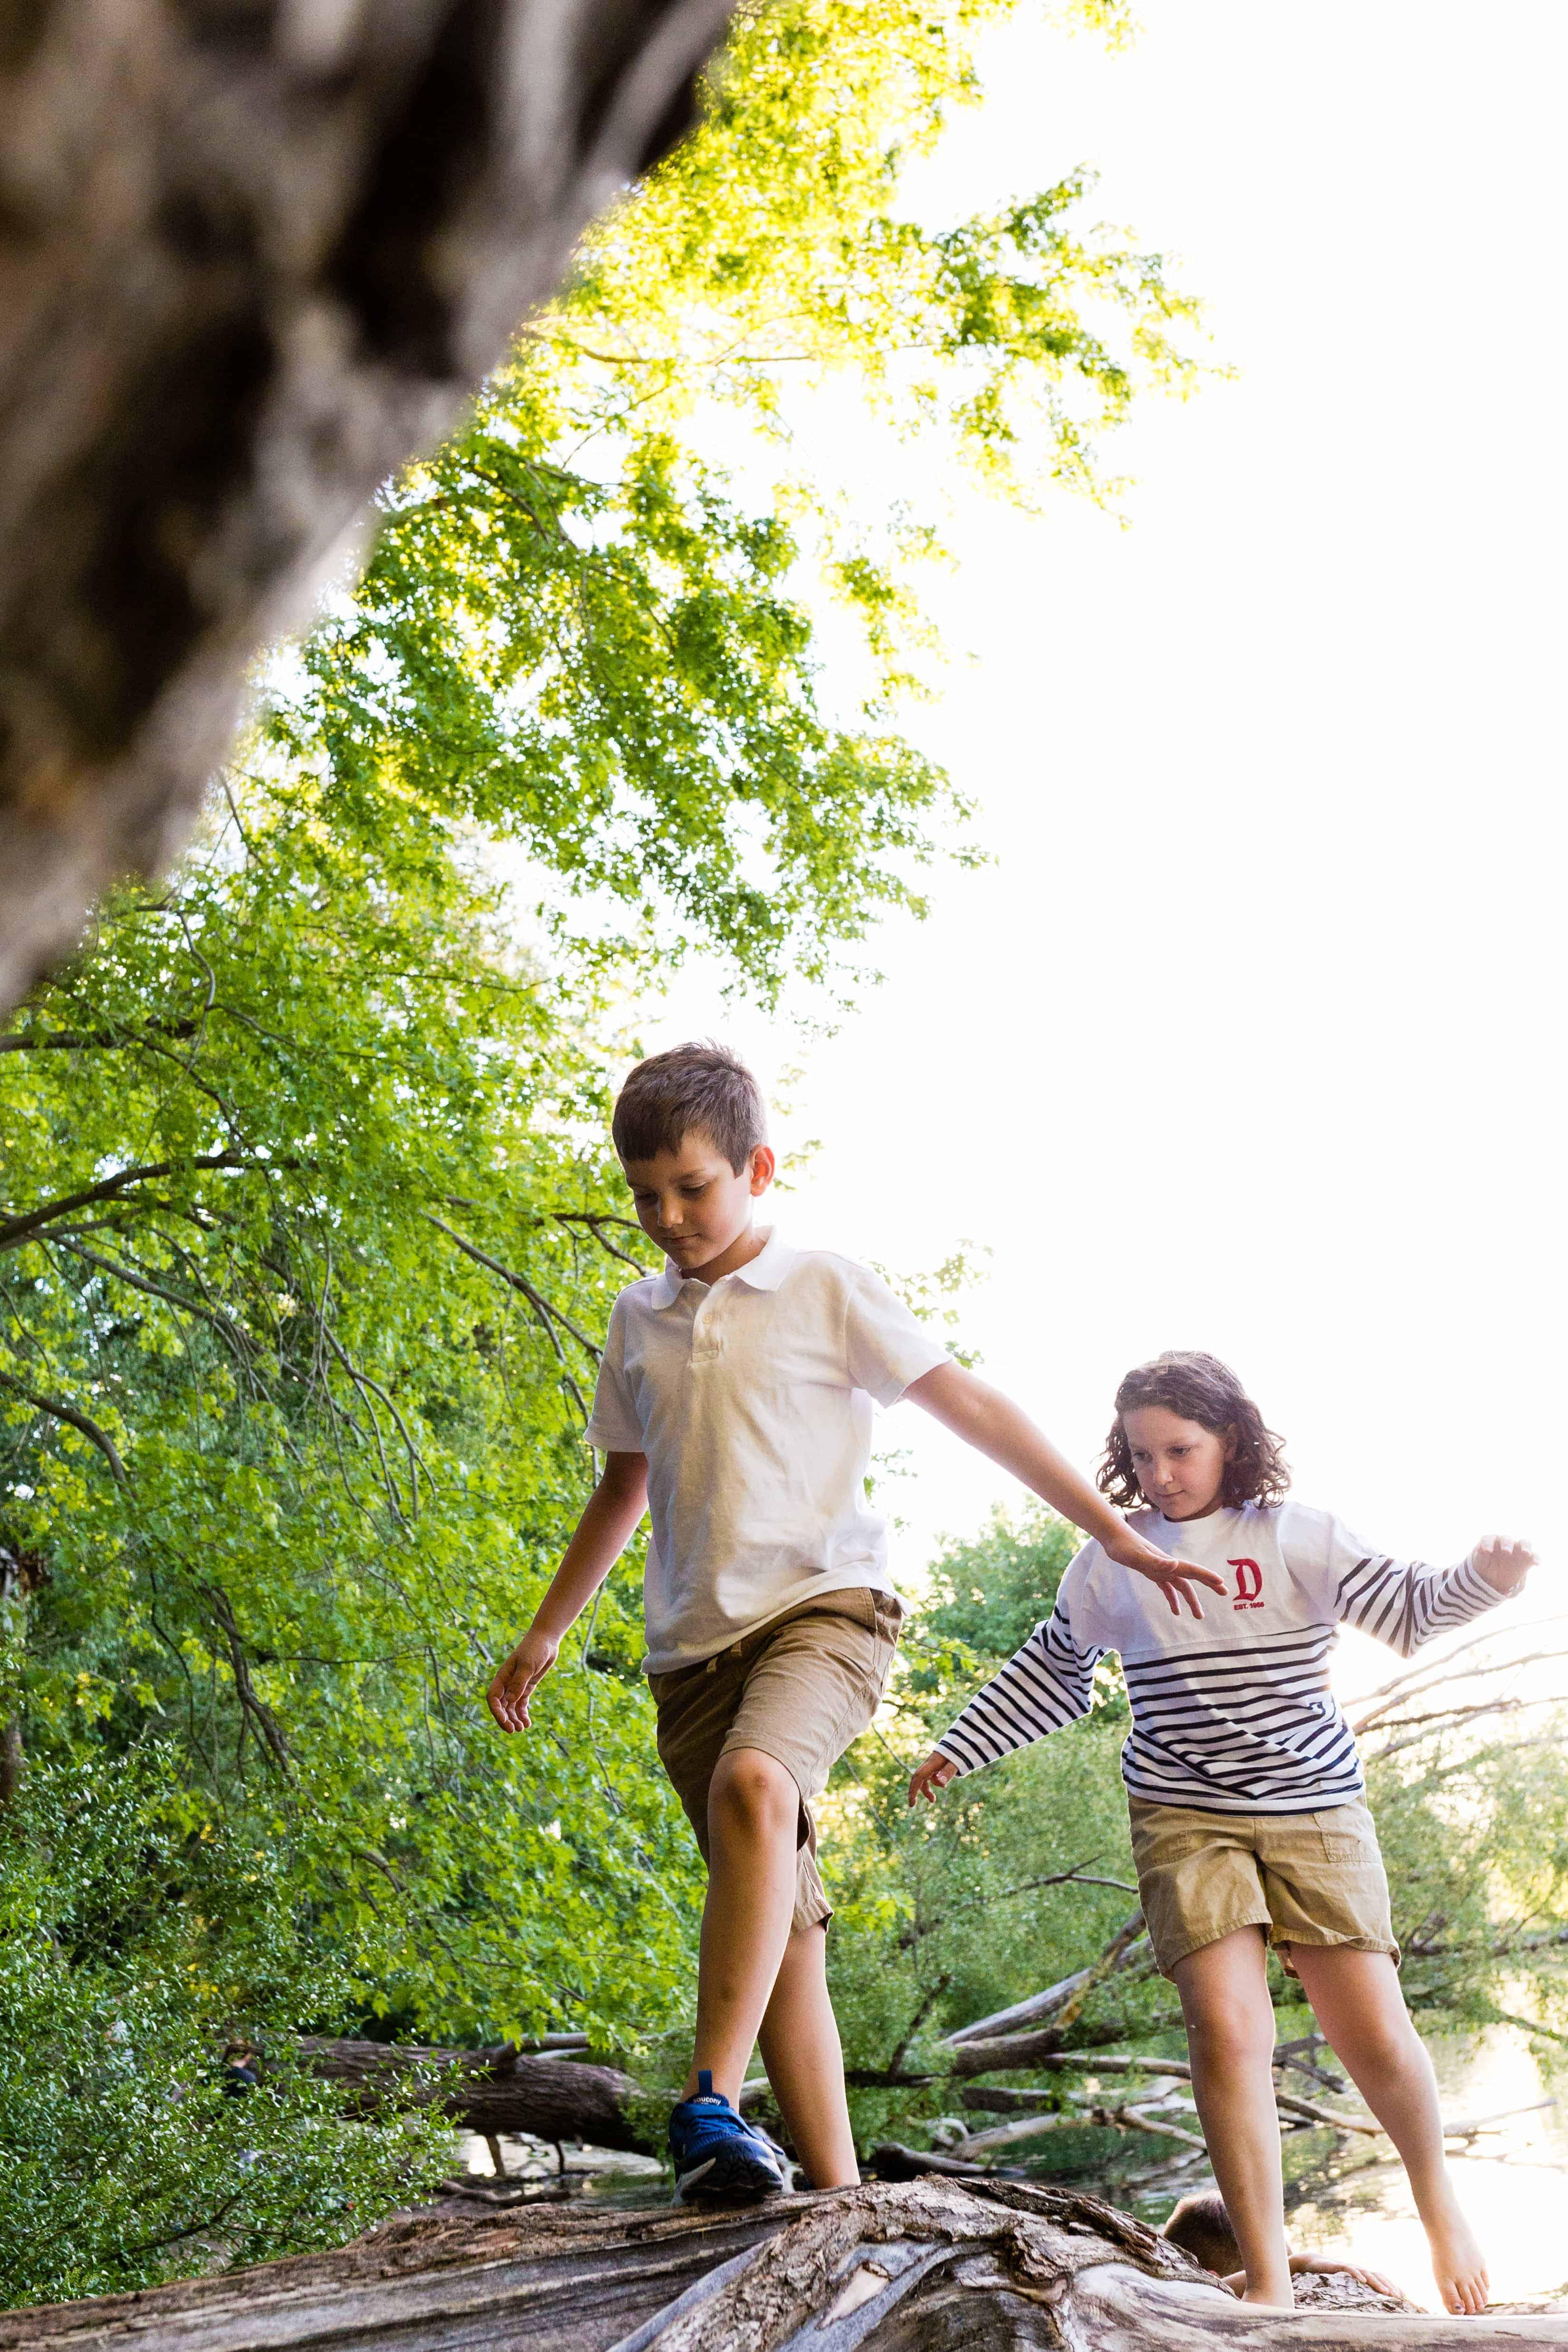 boy and girl balancing and walking on a log outside